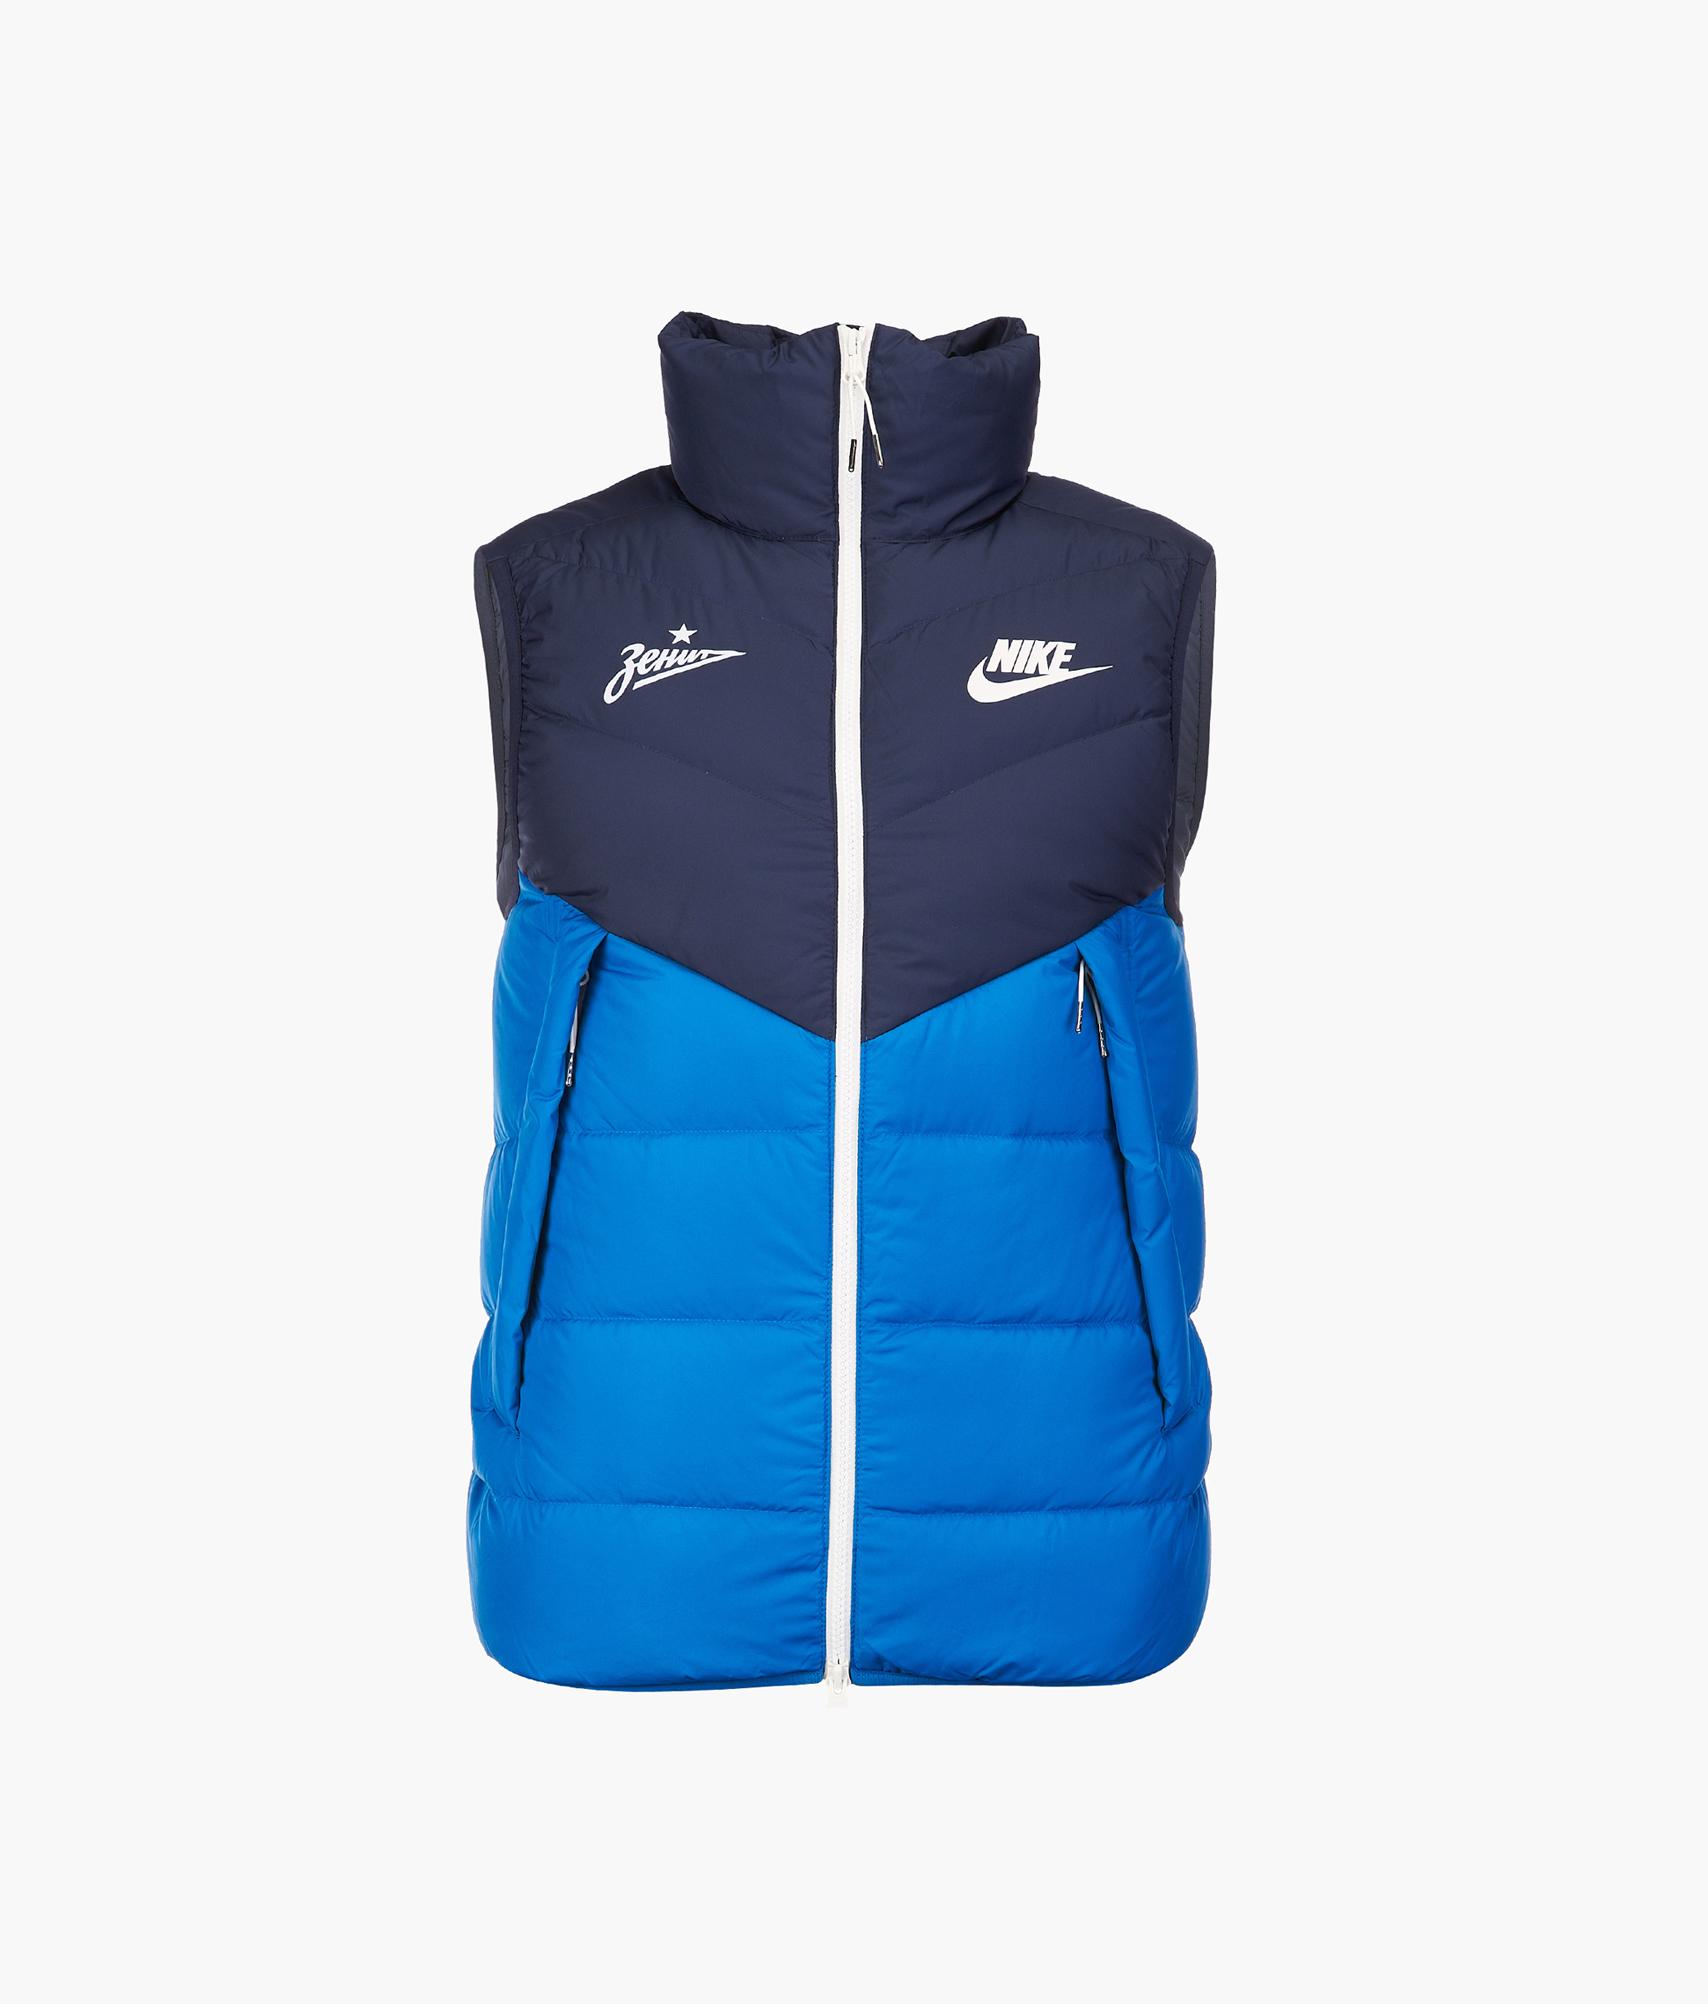 Жилет мужской Nike Zenit 2018/19 Nike сумка nike allegiance zenit shield compac ba5053 441